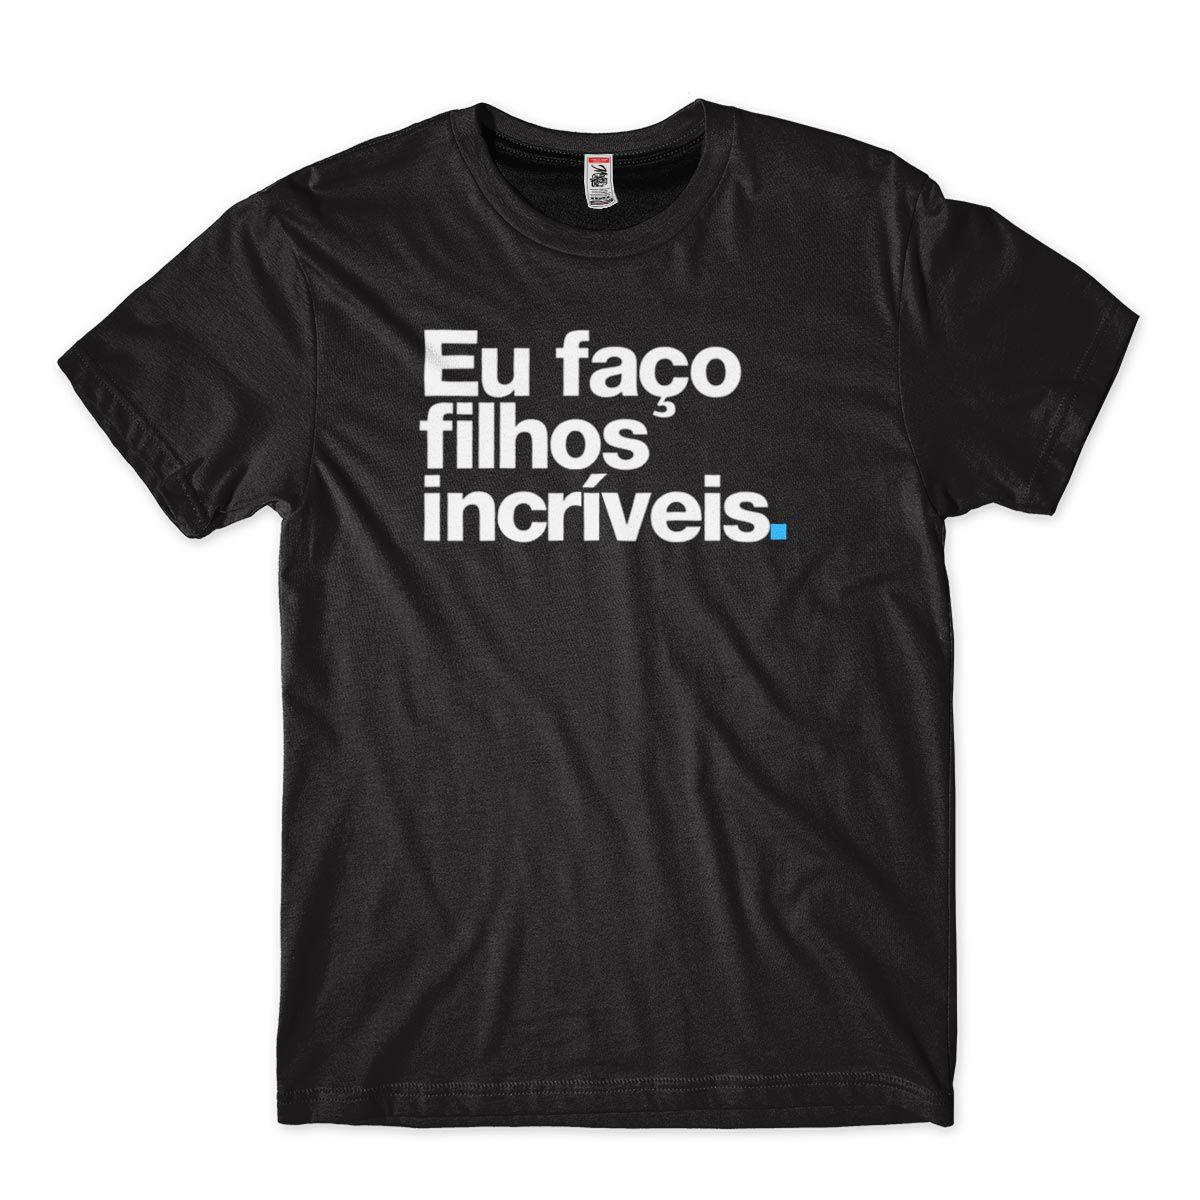 Camiseta Divertida Carnaval Faco Filhos Incriveis